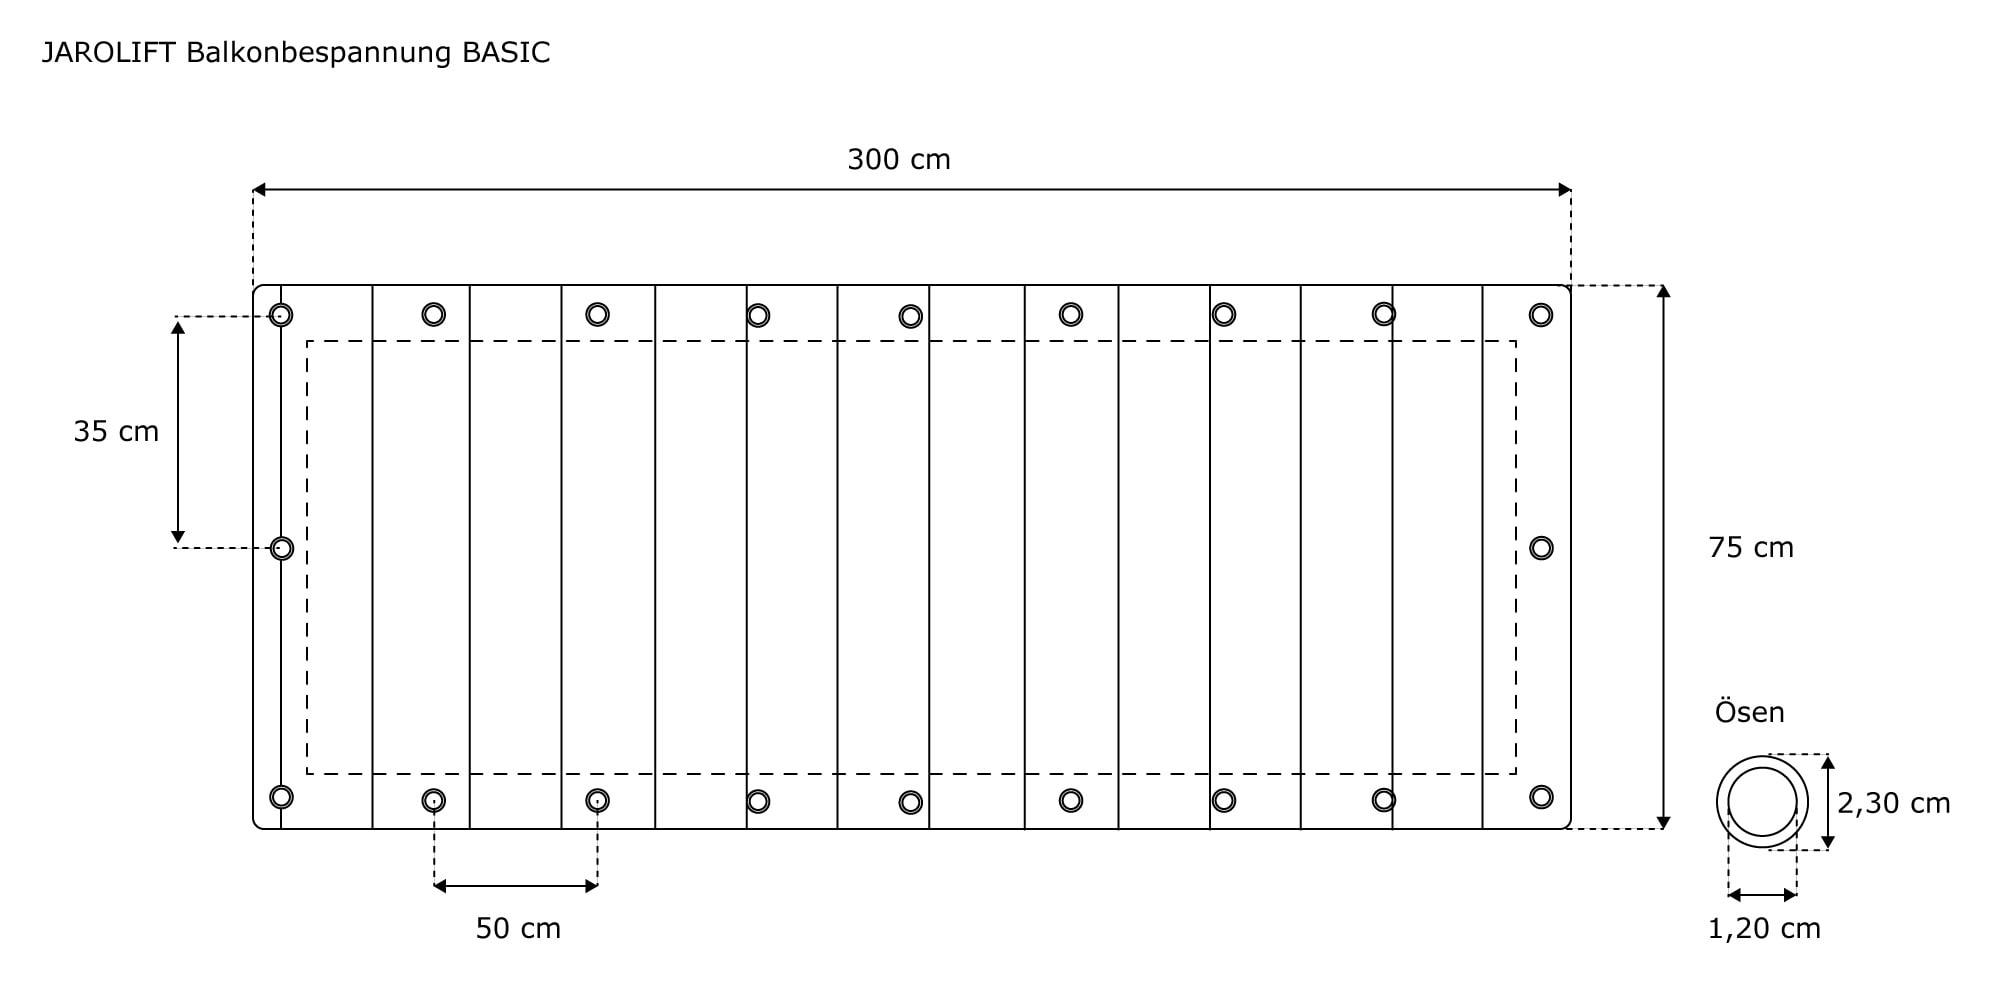 Jarolift Balkonbespannung Sichtschutz Balkon Zaun Windschutz